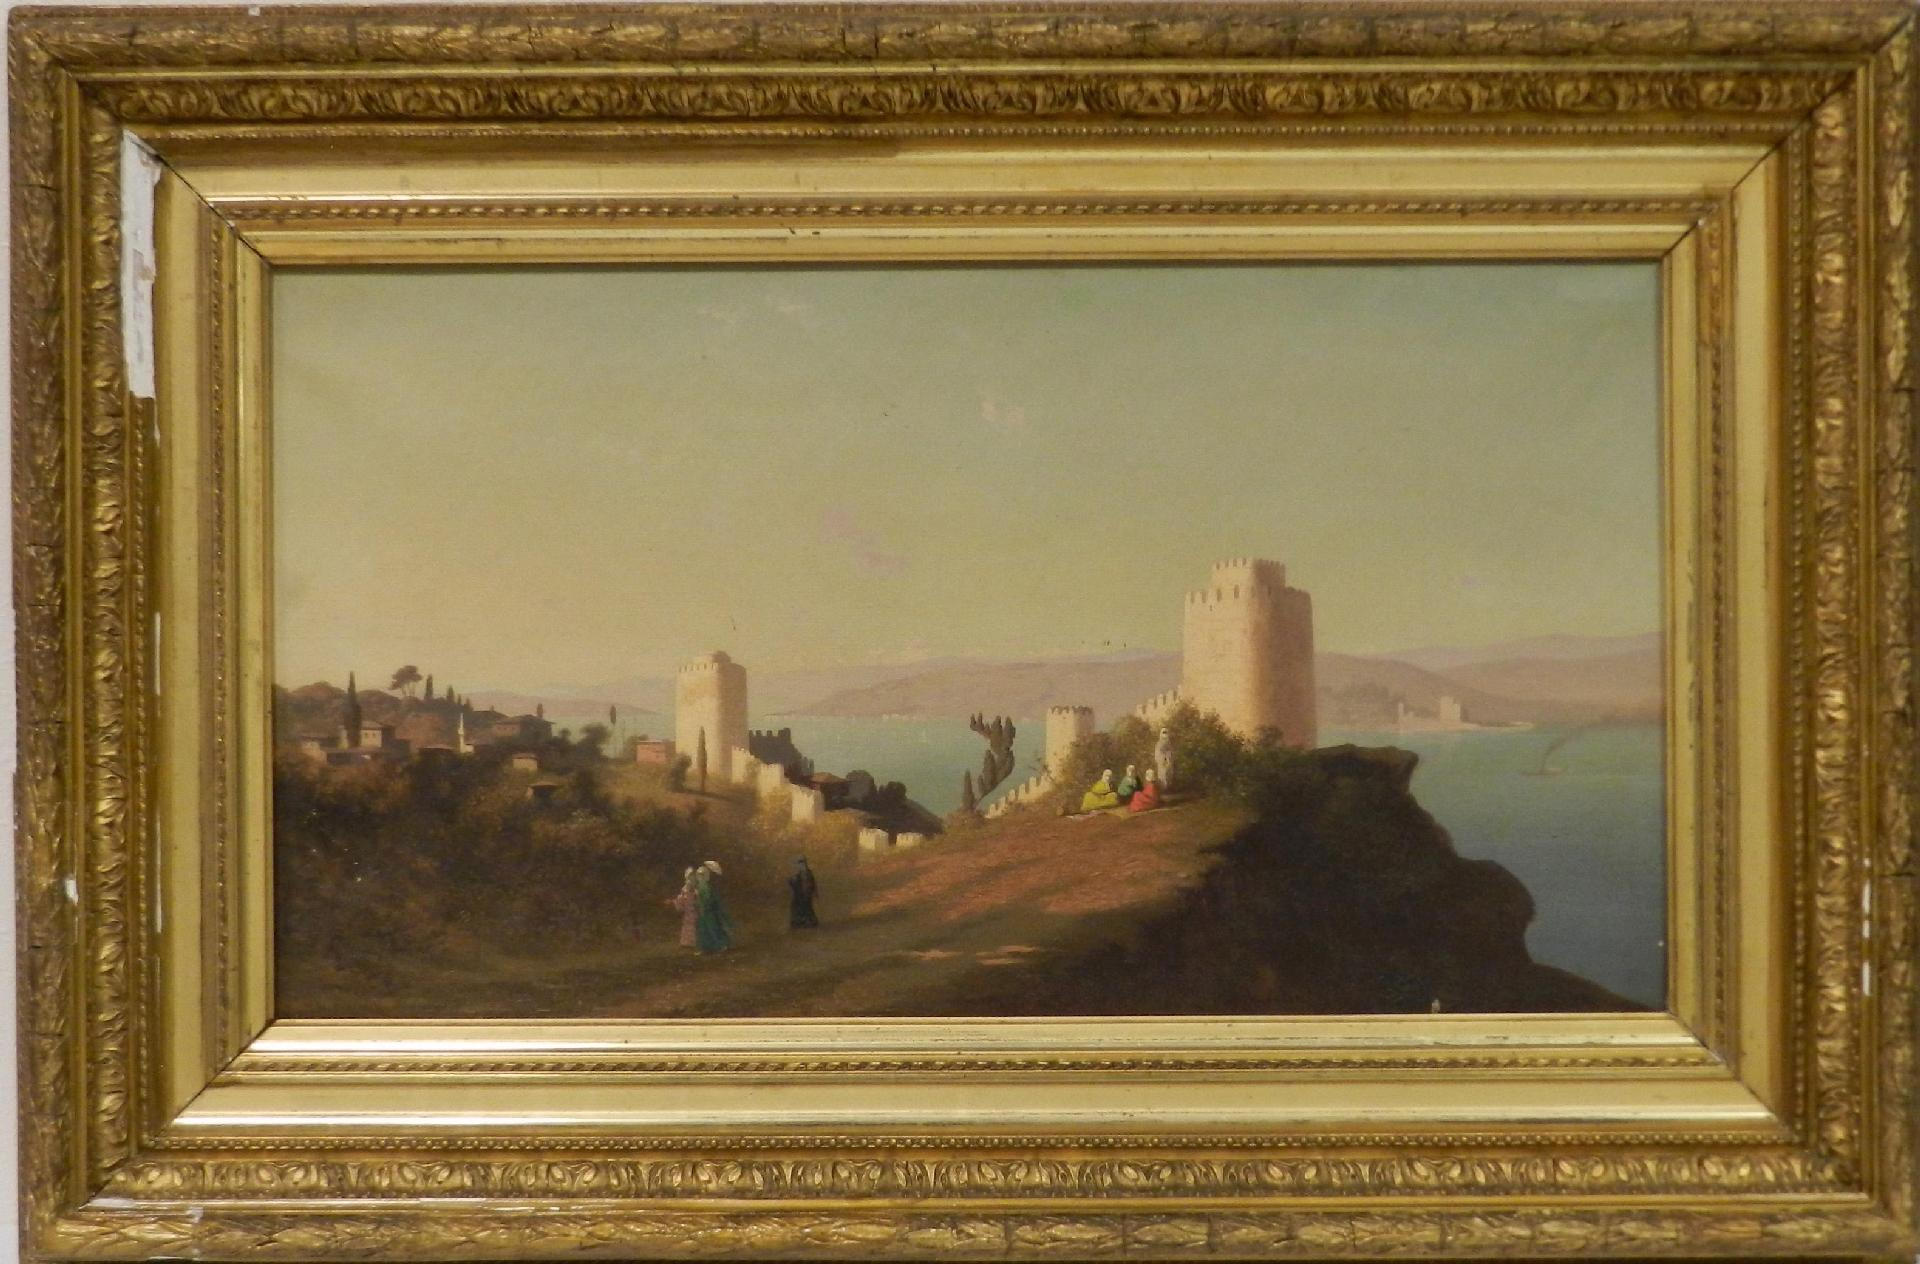 Forteresse Humeli-Hisard de Constantinople